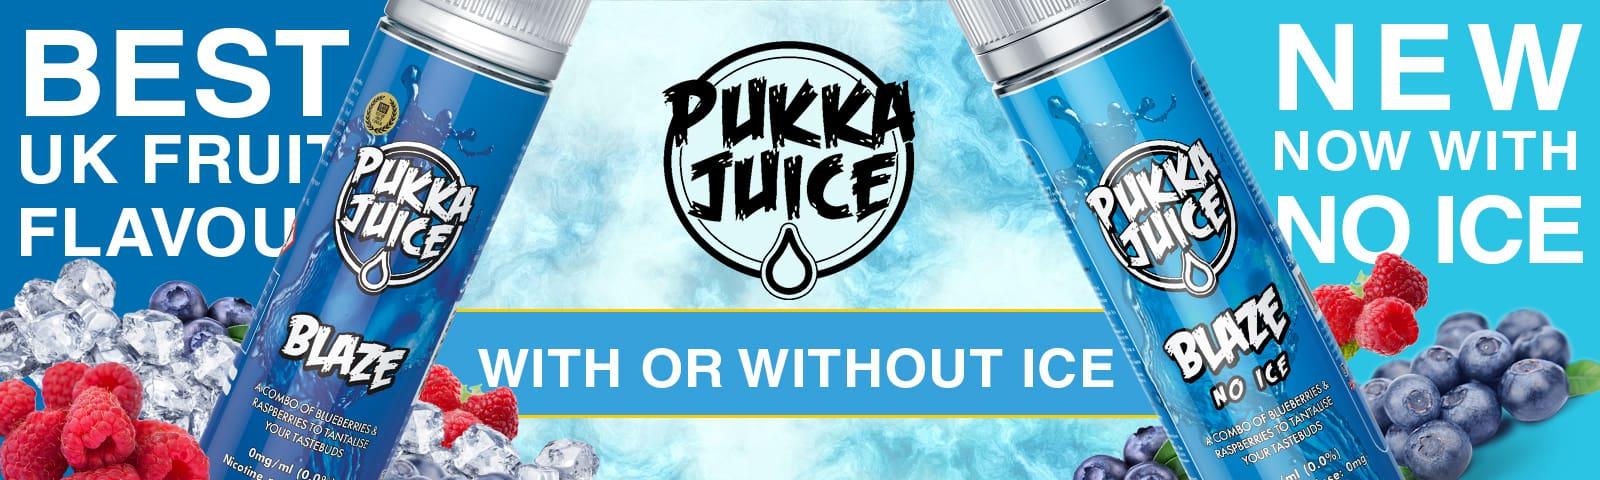 Pukka Juice Blaze No Ice